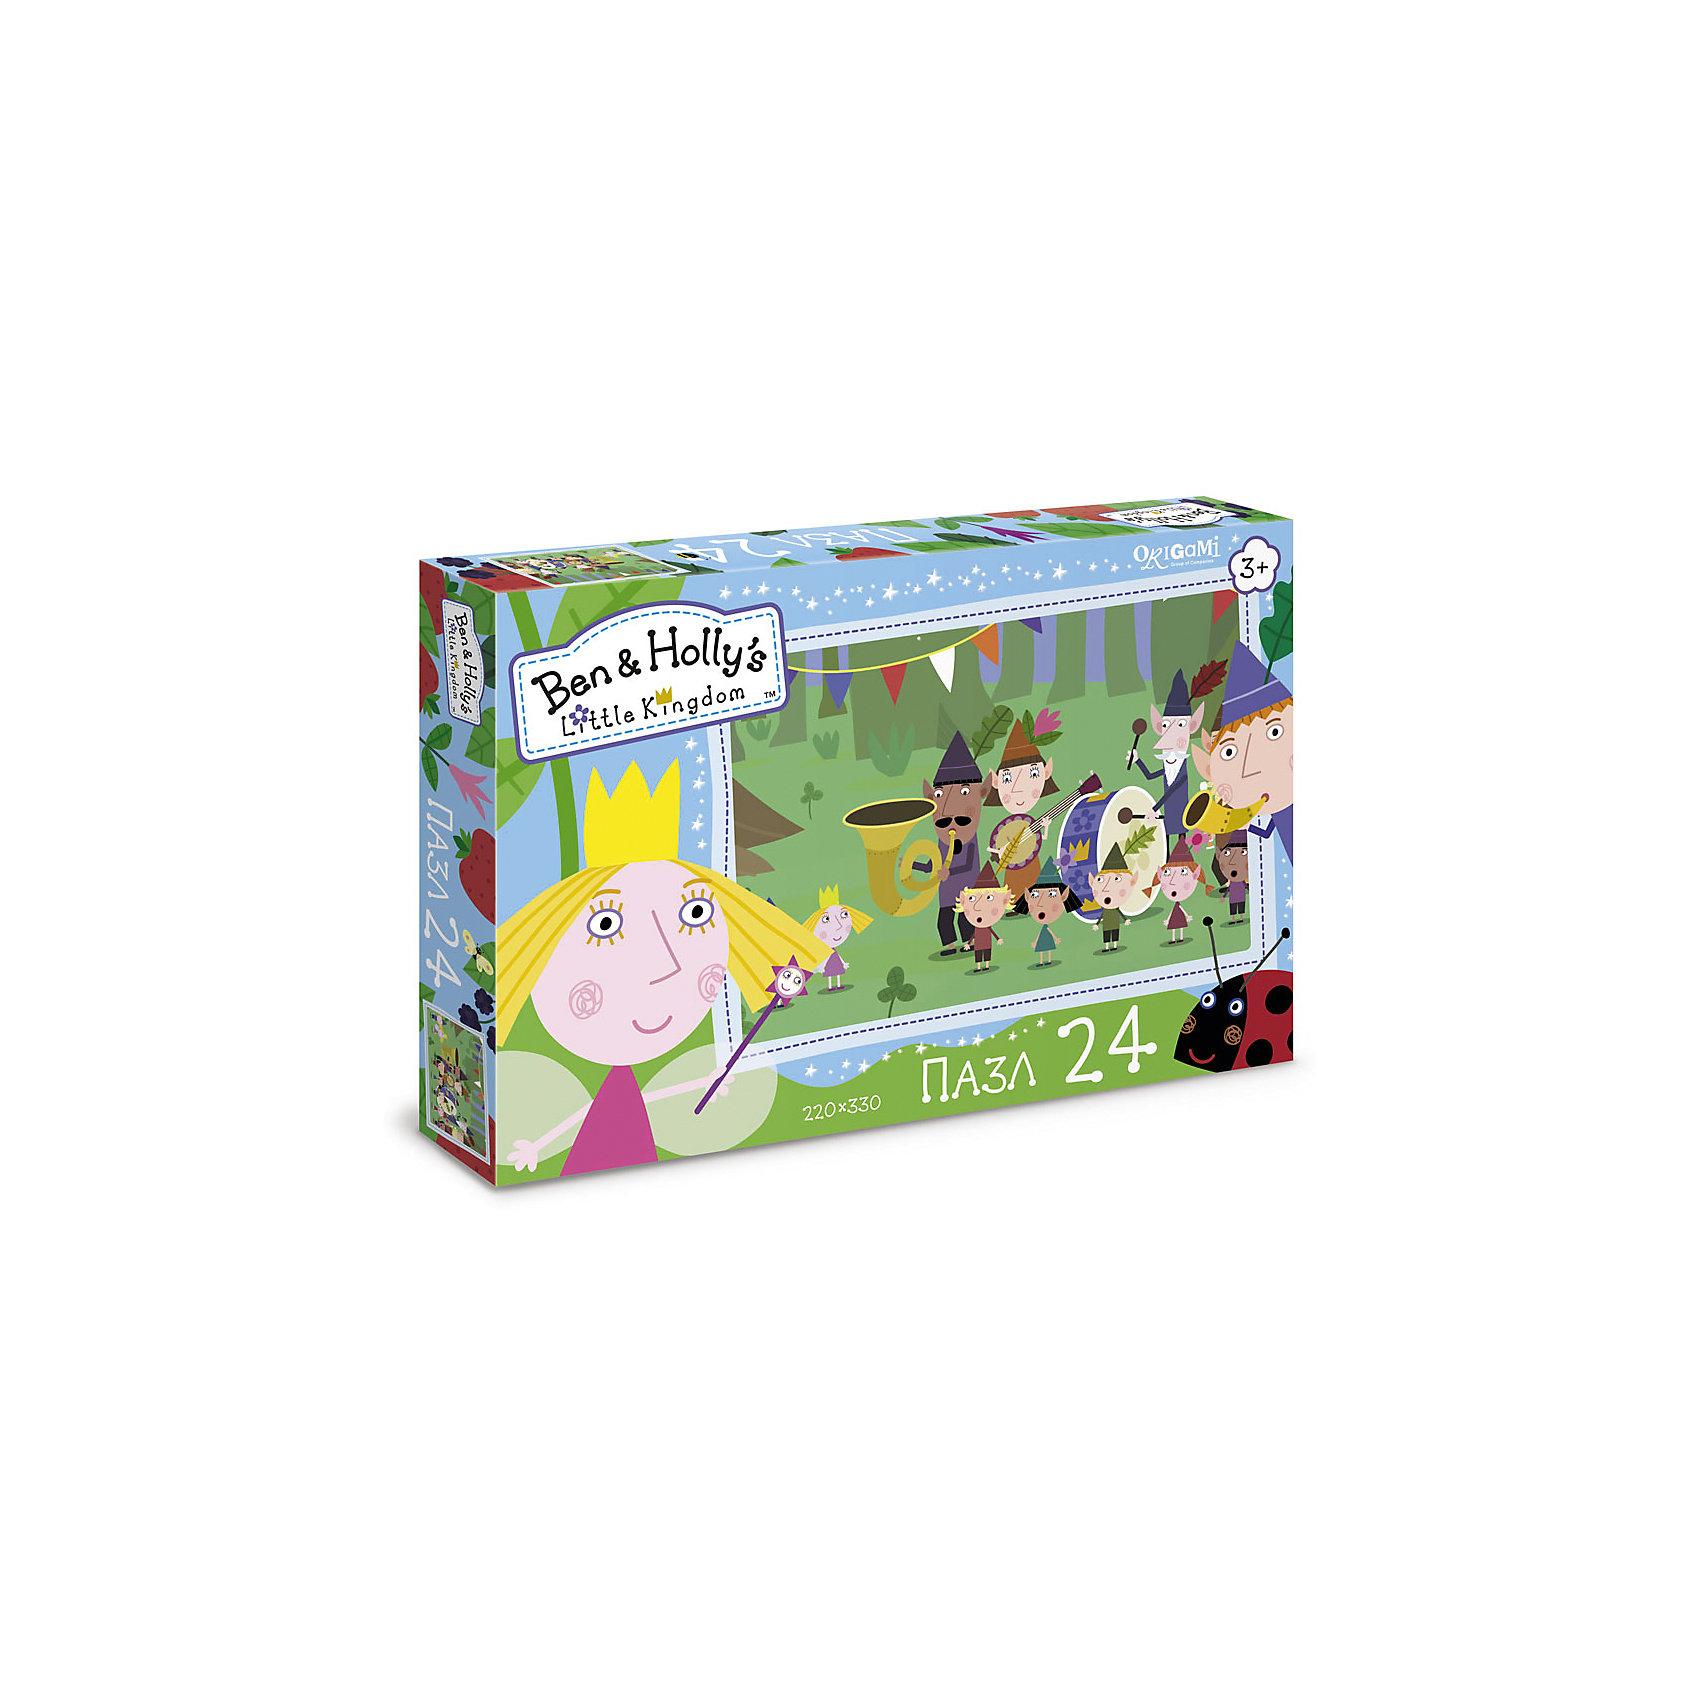 Пазл Музыканты, Бен и Холли, OrigamiПазлы для малышей<br>Пазл 24 элемента в коробке с крышкой. Комплектность: пазл (220х330). Рекомендованный возраст 3+.<br><br>Ширина мм: 265<br>Глубина мм: 35<br>Высота мм: 175<br>Вес г: 100<br>Возраст от месяцев: 36<br>Возраст до месяцев: 72<br>Пол: Унисекс<br>Возраст: Детский<br>SKU: 5528402